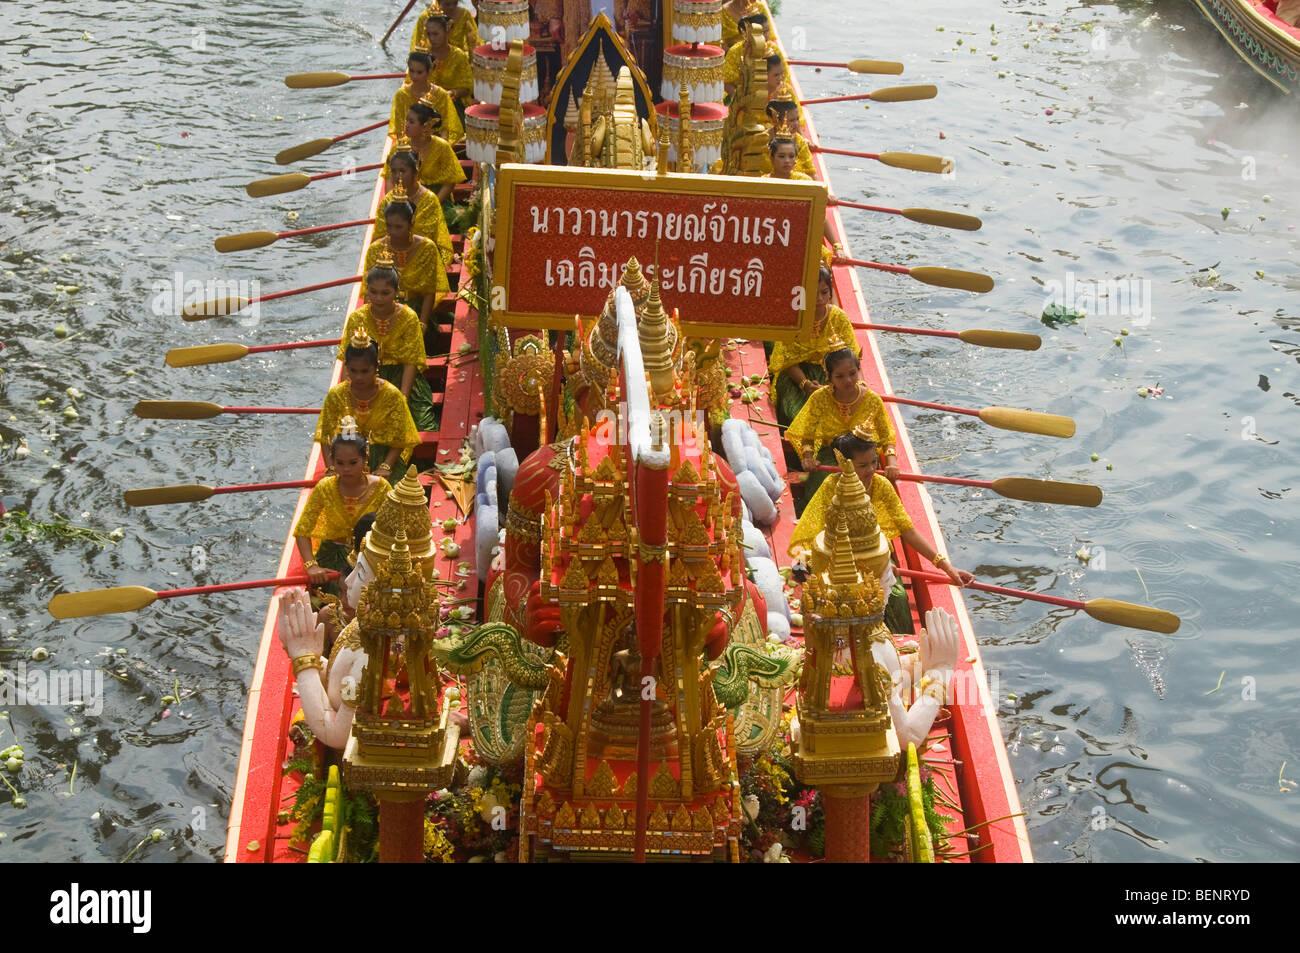 Buddhist Retreat Stock Photos & Buddhist Retreat Stock Images - Alamy